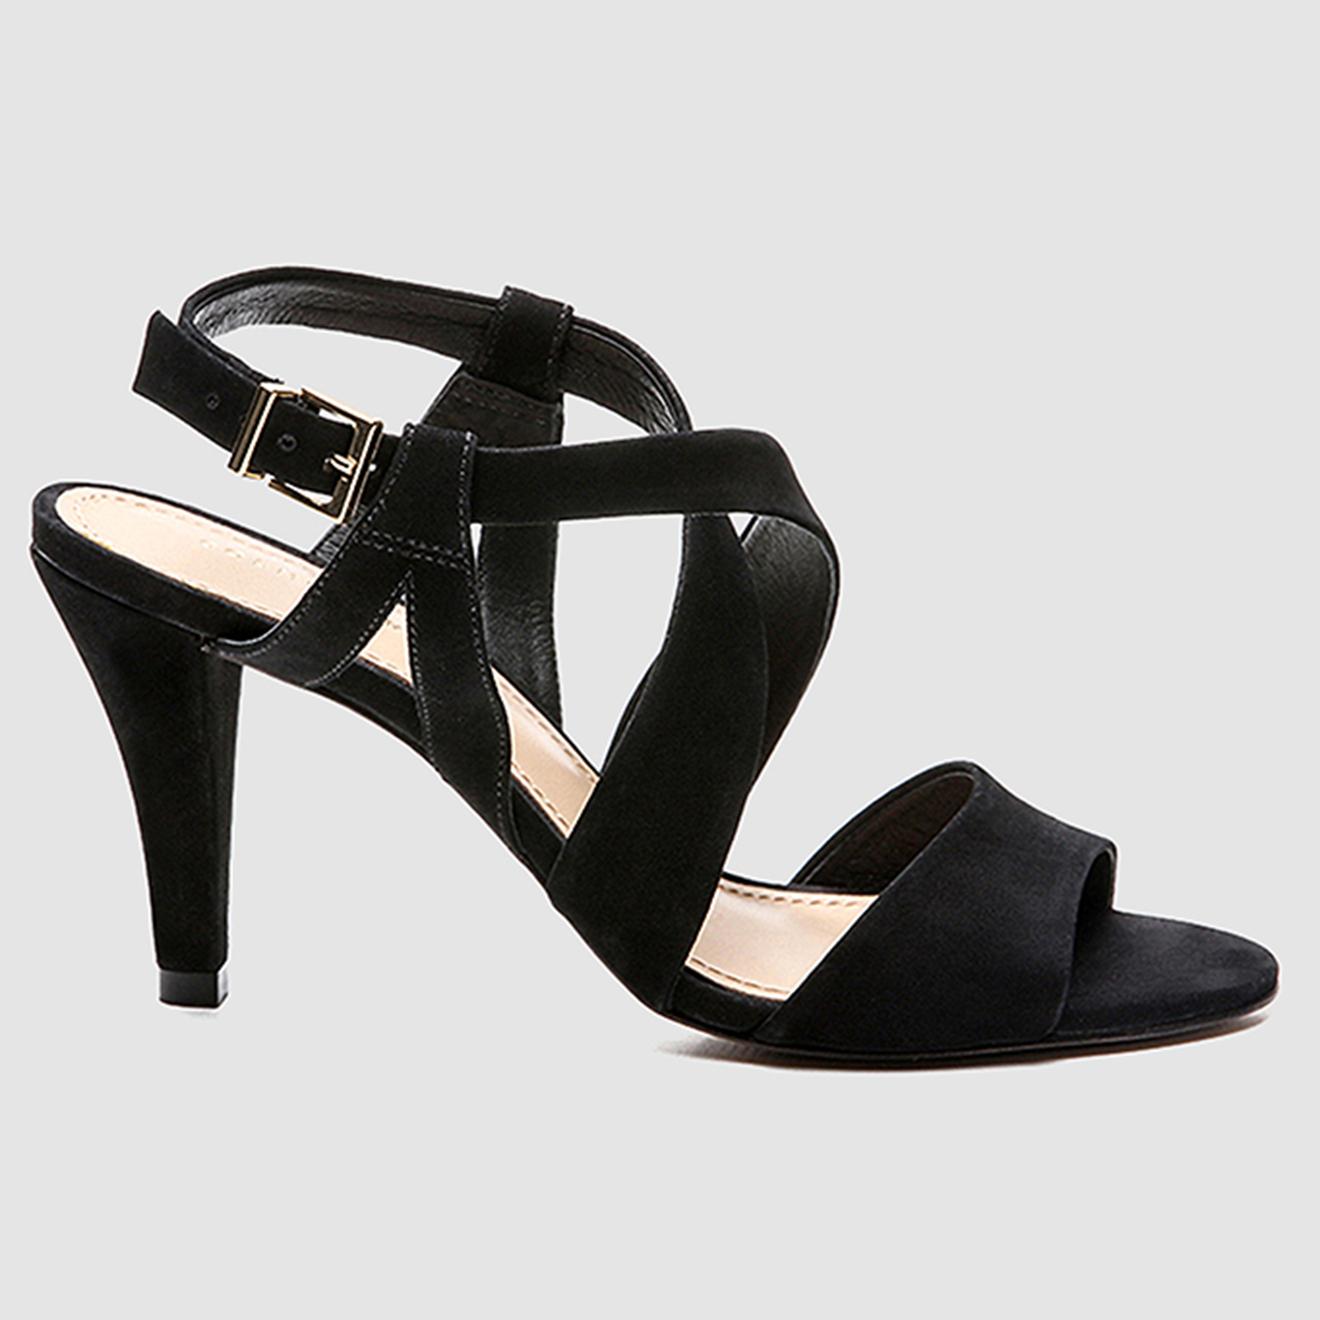 Sandales en Velours de Cuir Jiji noires - Talon 8 cm - Cosmoparis - Modalova